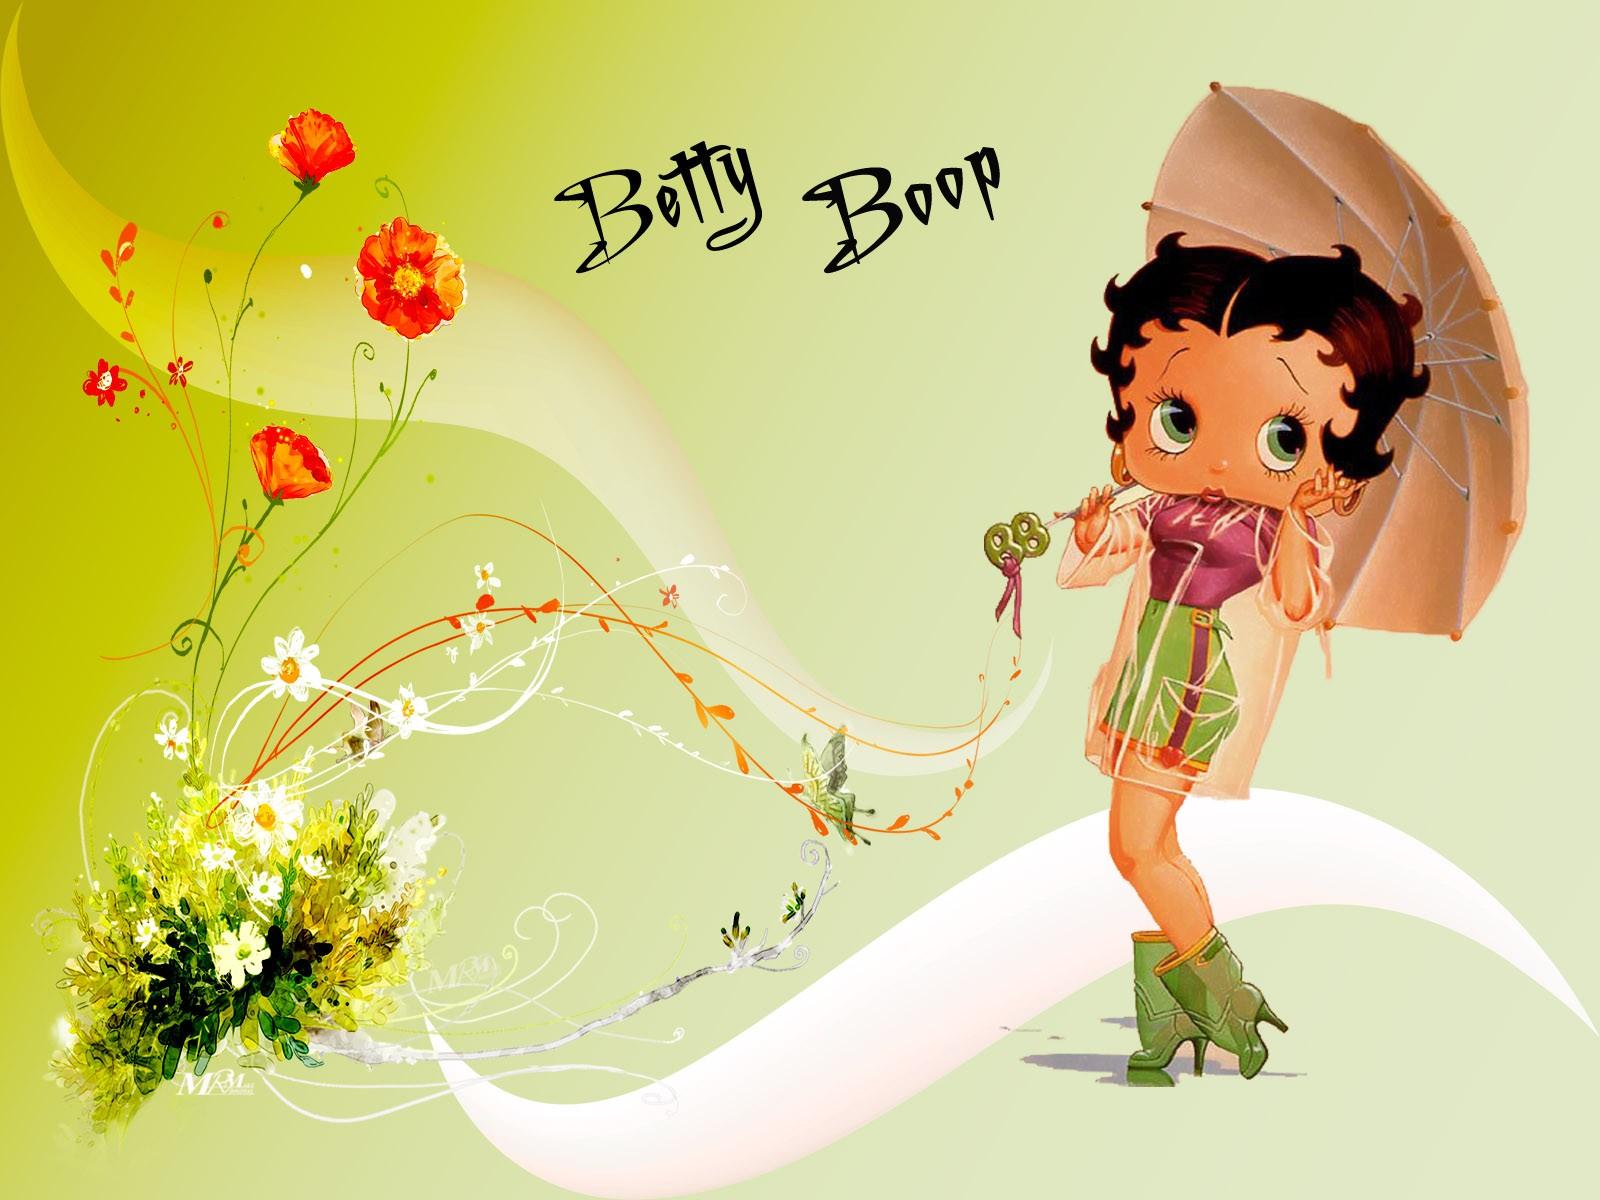 Imagenes De Betty Boop Para Celular